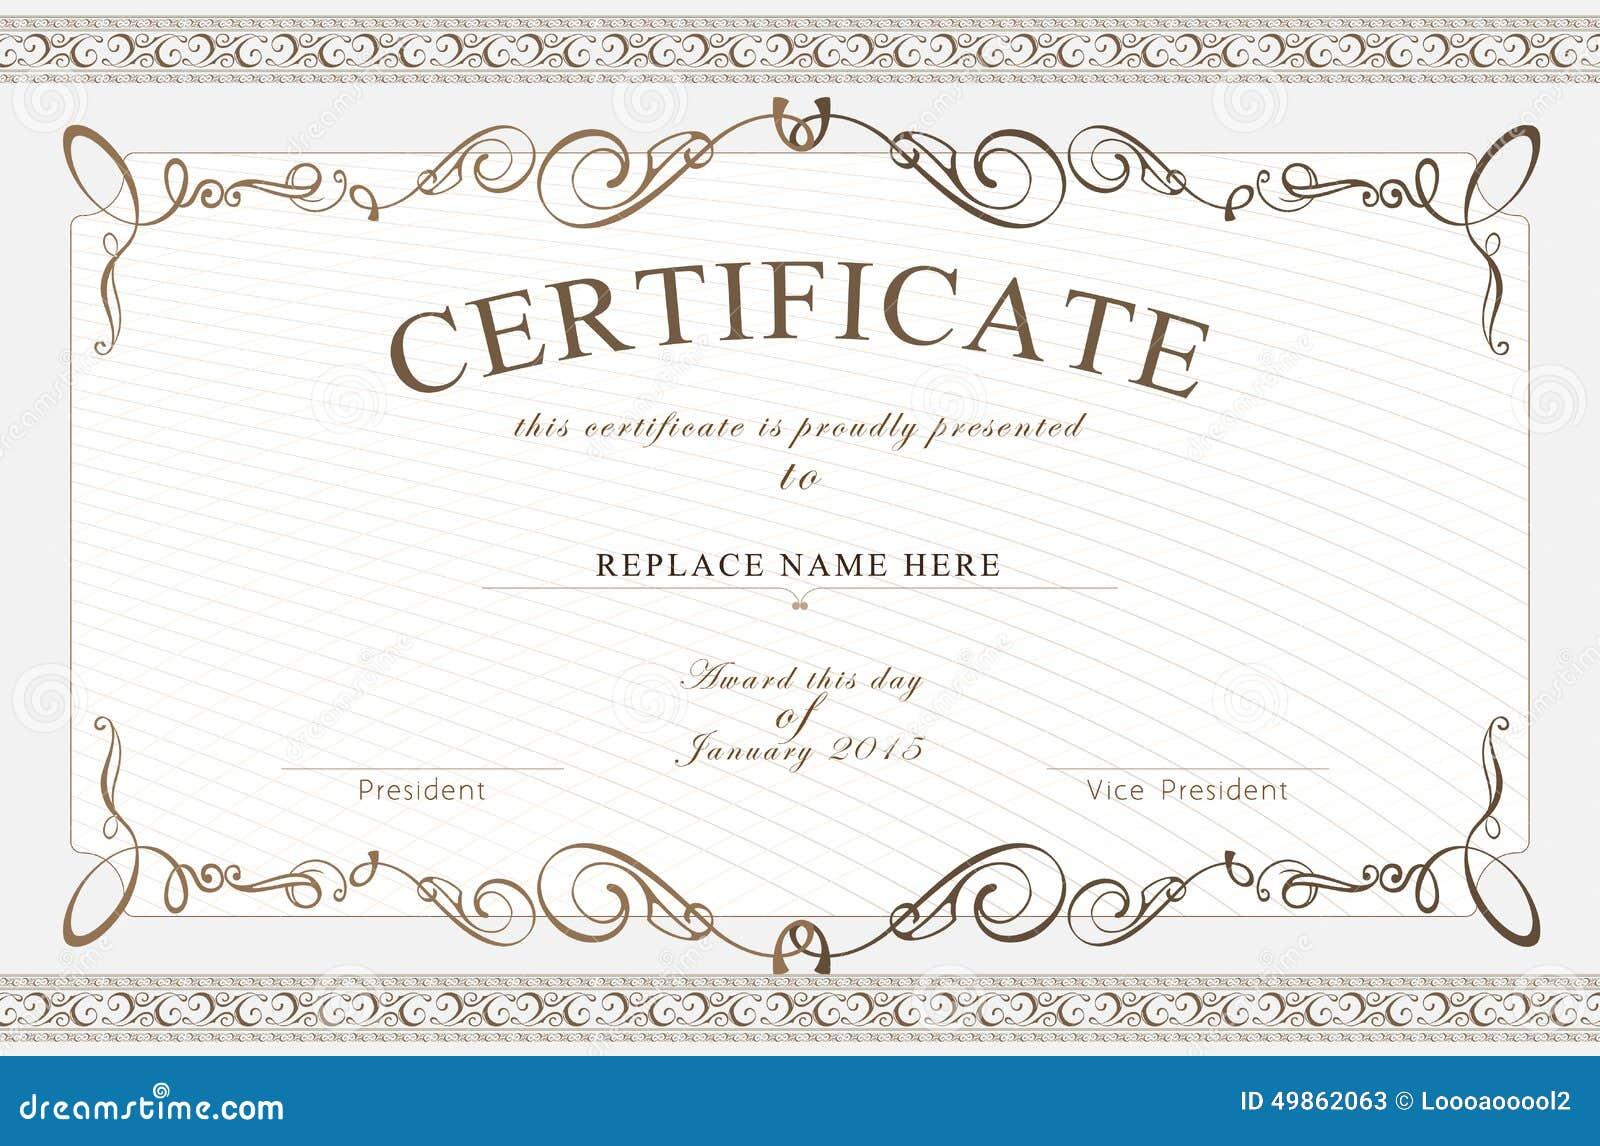 Certificate border certificate template vector illustration stock vector image 49862063 for Vector certificate